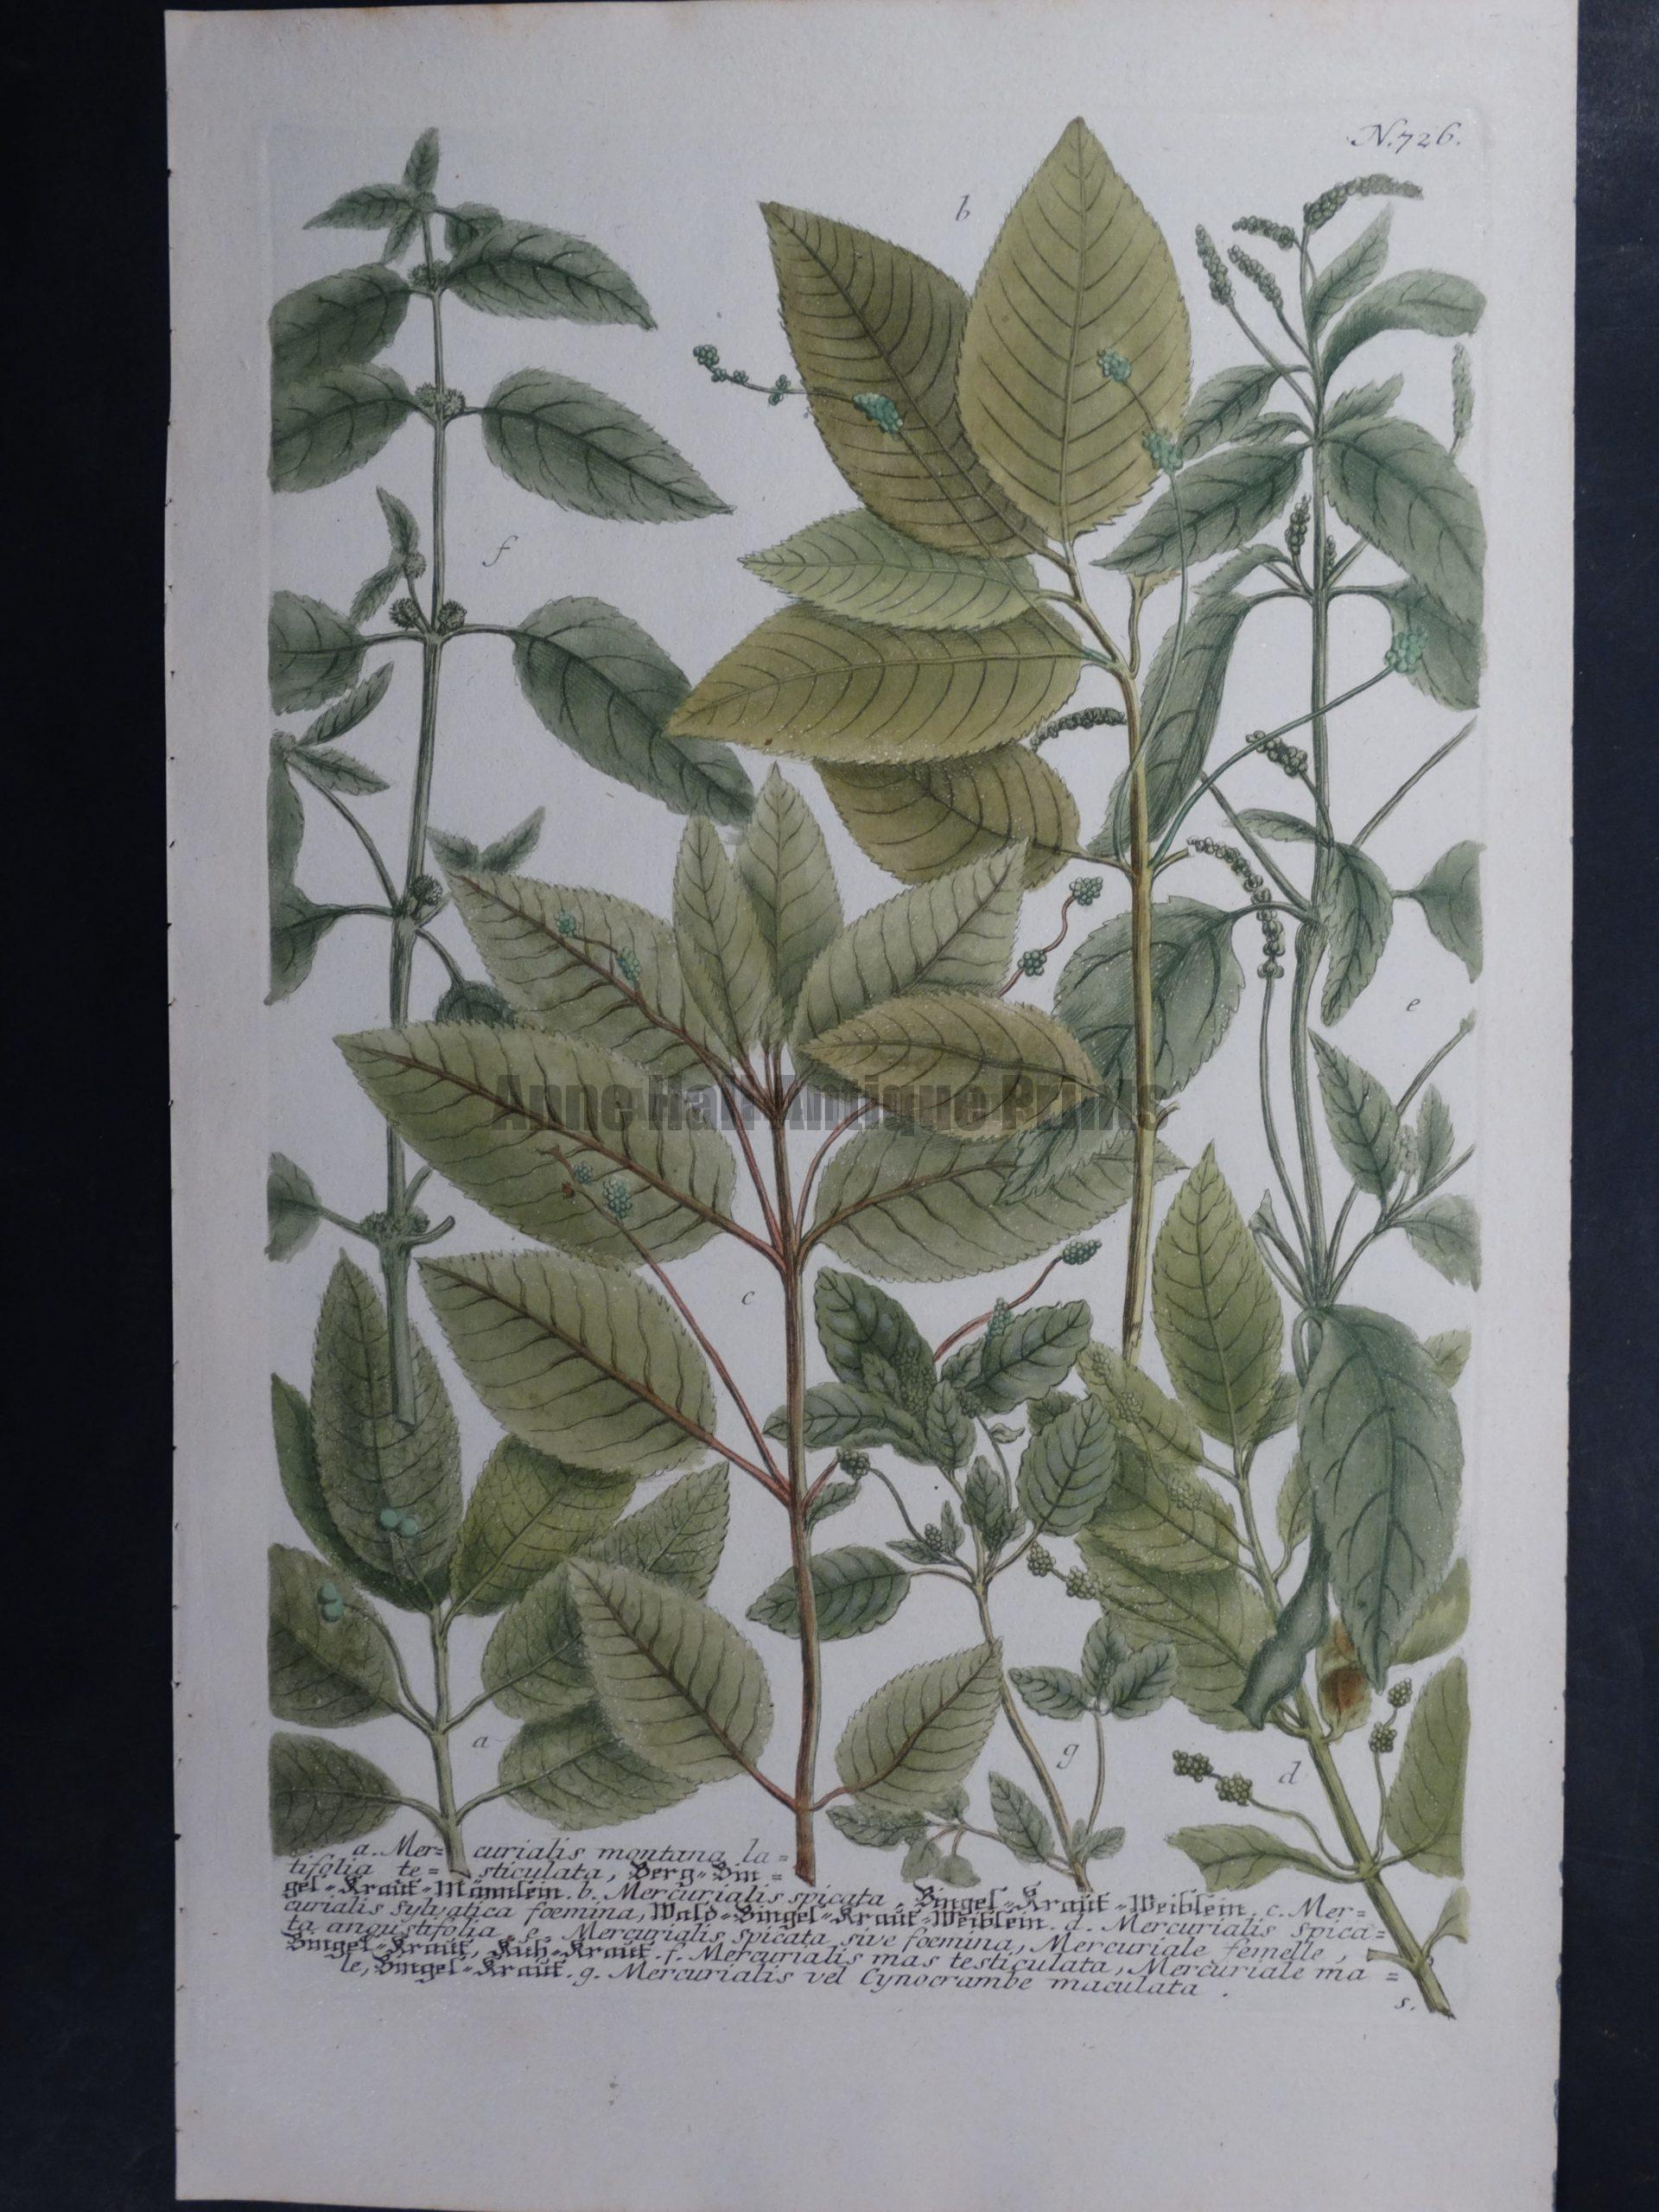 Weinmann Mercurialis 726 Johann Wilhelm Weinmann Phytanthoza iconographia. 1737-1745.